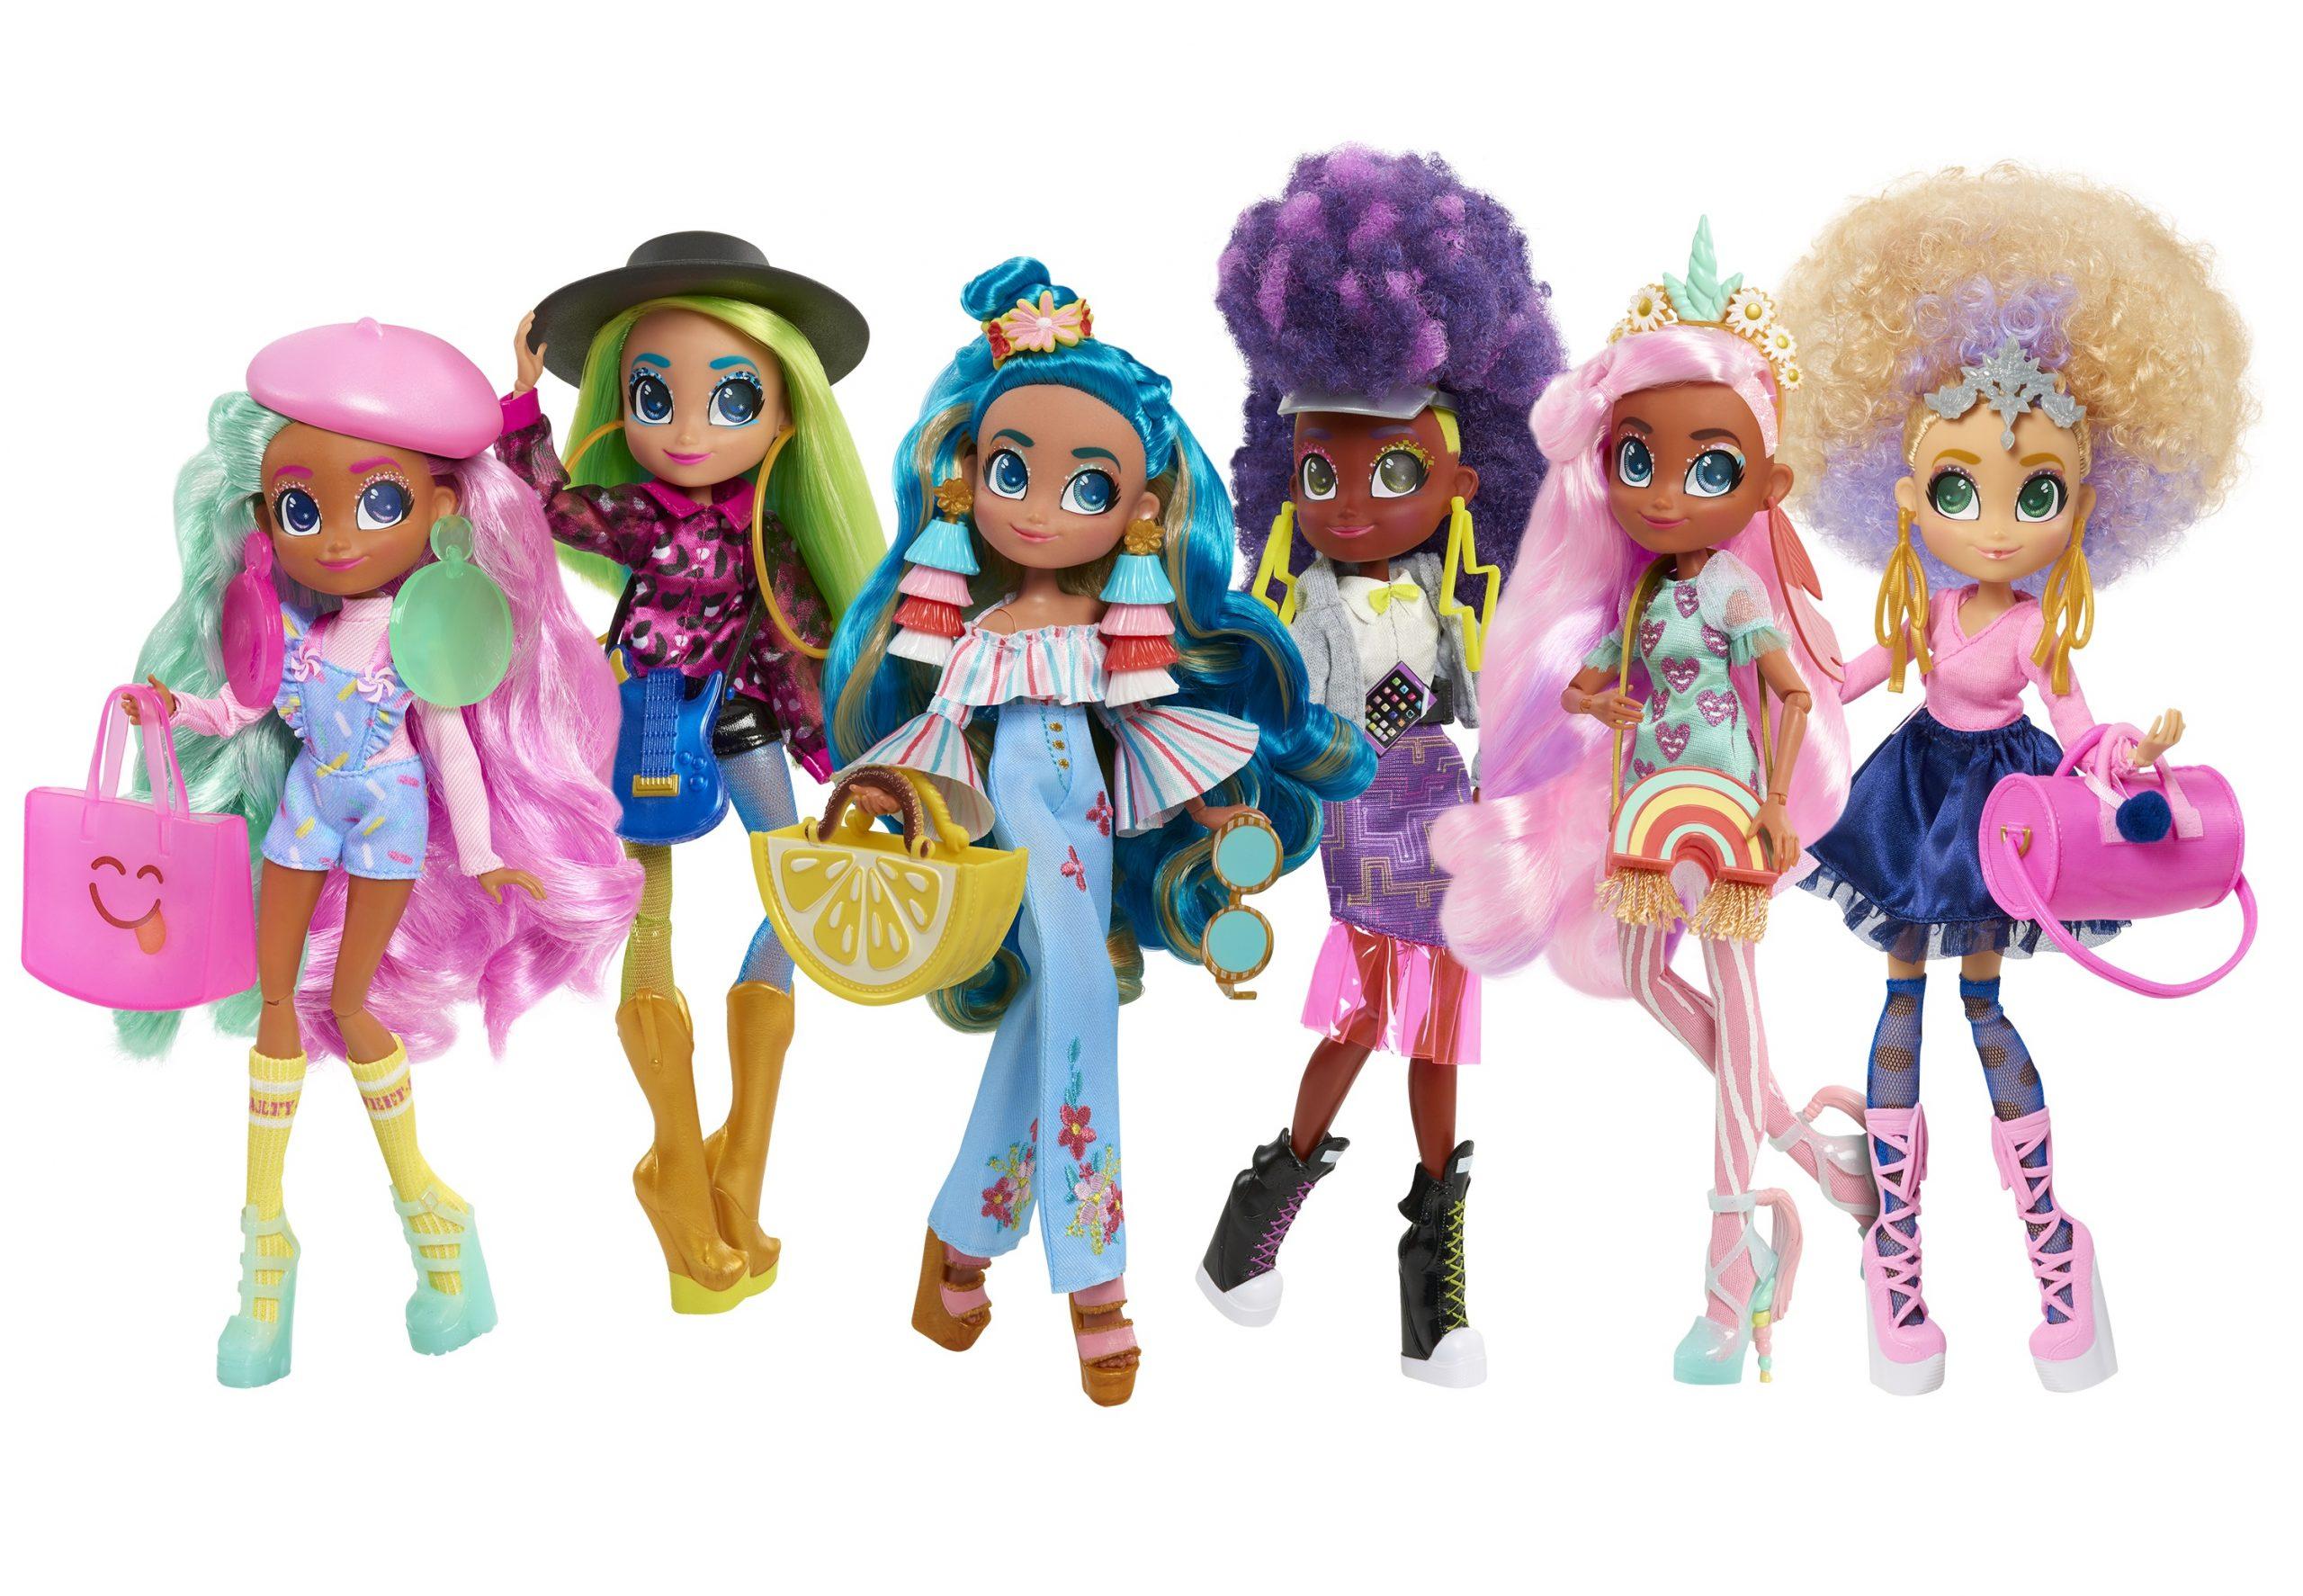 Hairdorables Hairmazing Fashion Dolls